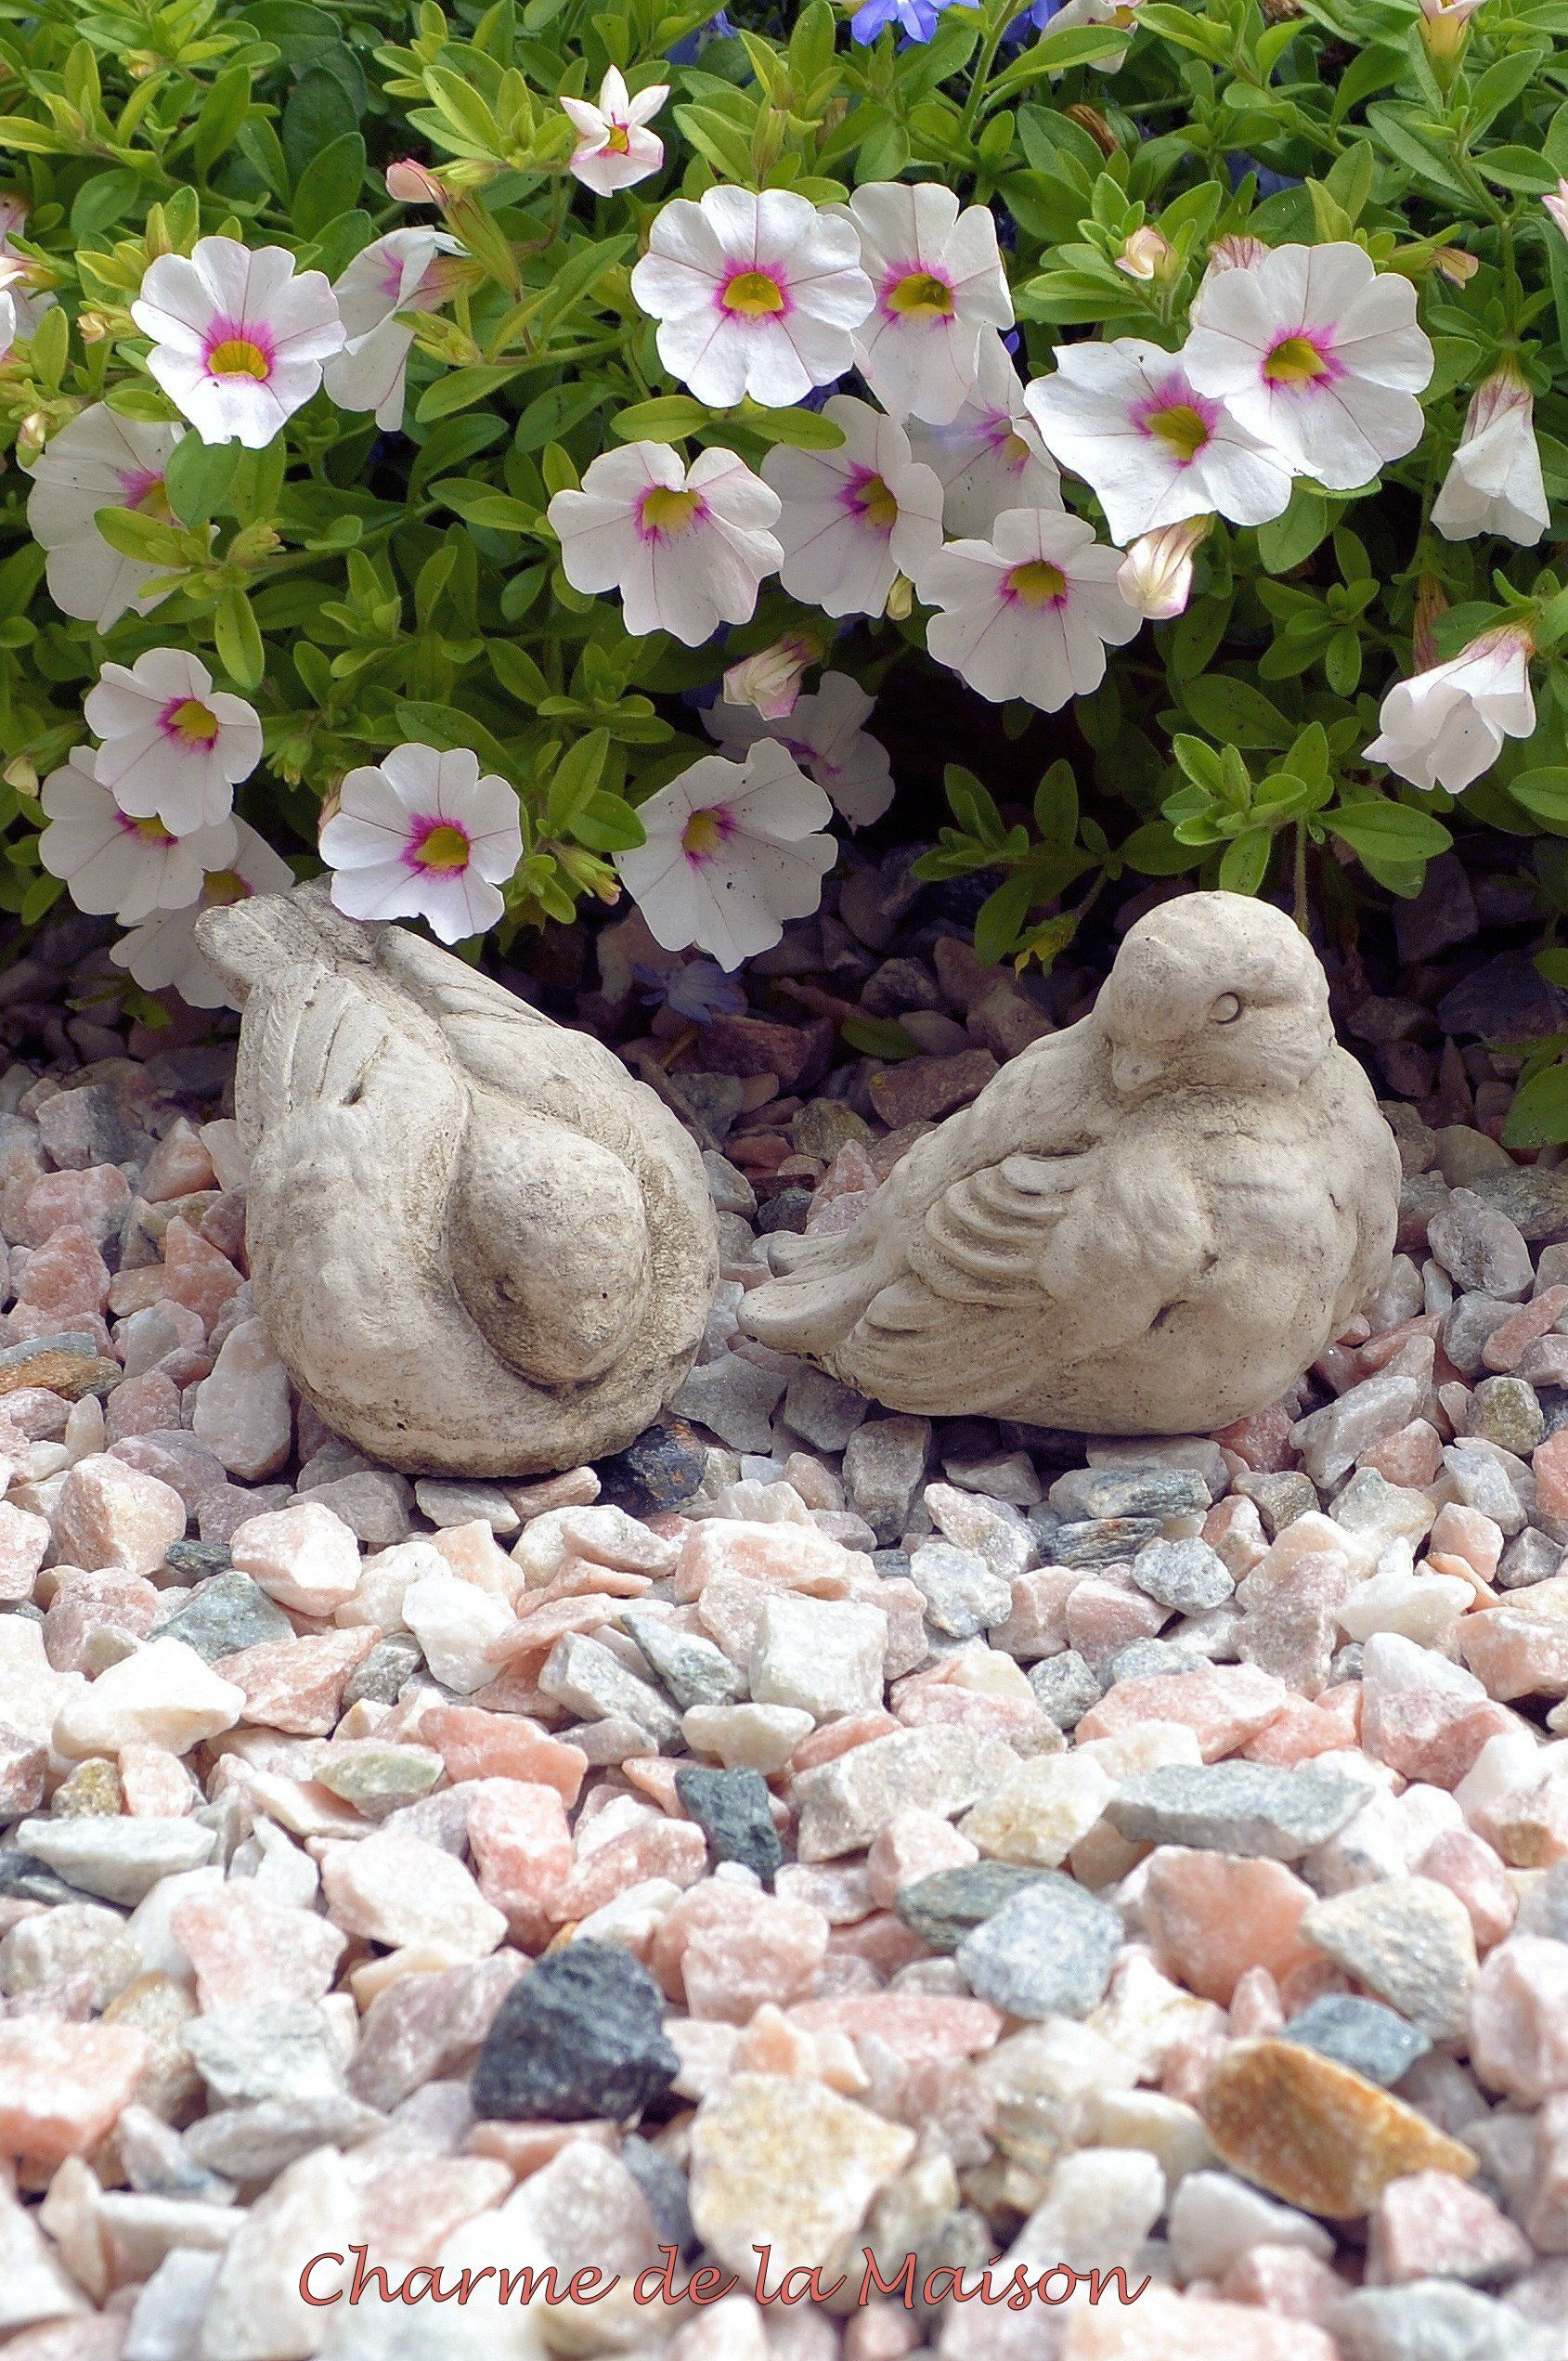 Deko Vogelpaar Englischer Steinguss Http Www Charmedelamaison De Gartendekoration Gartendekoration Garten Garten Deko